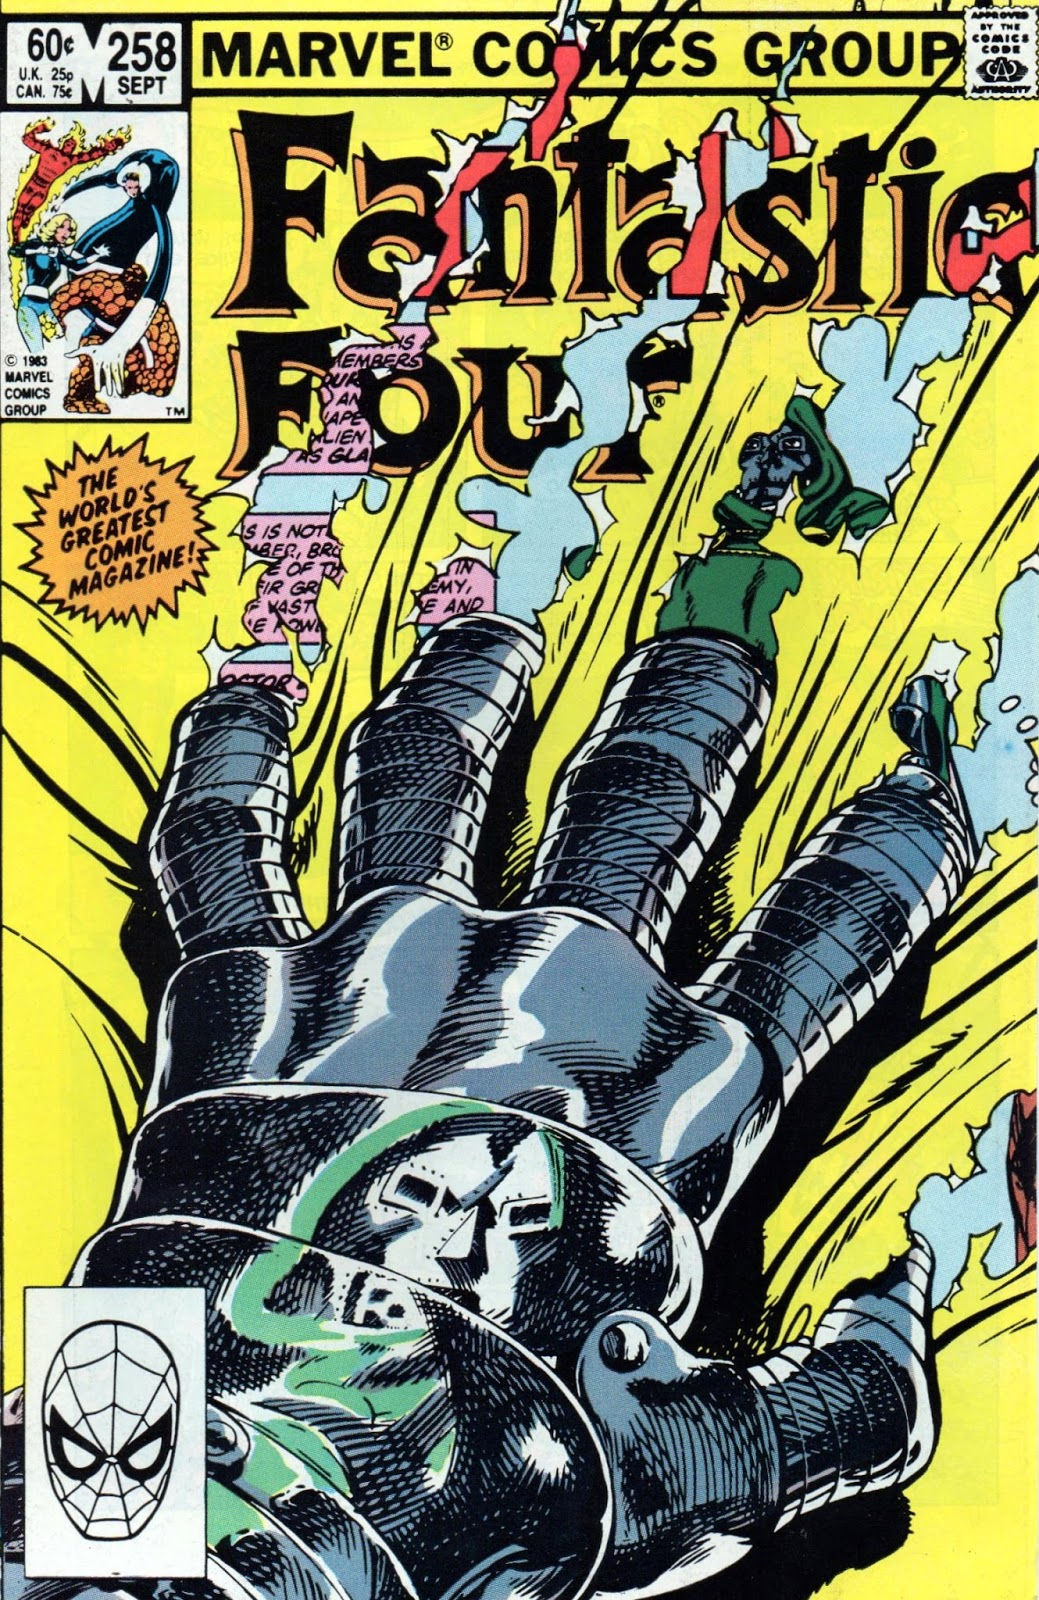 Fantastic Four 258: Reviews Of Old Comics